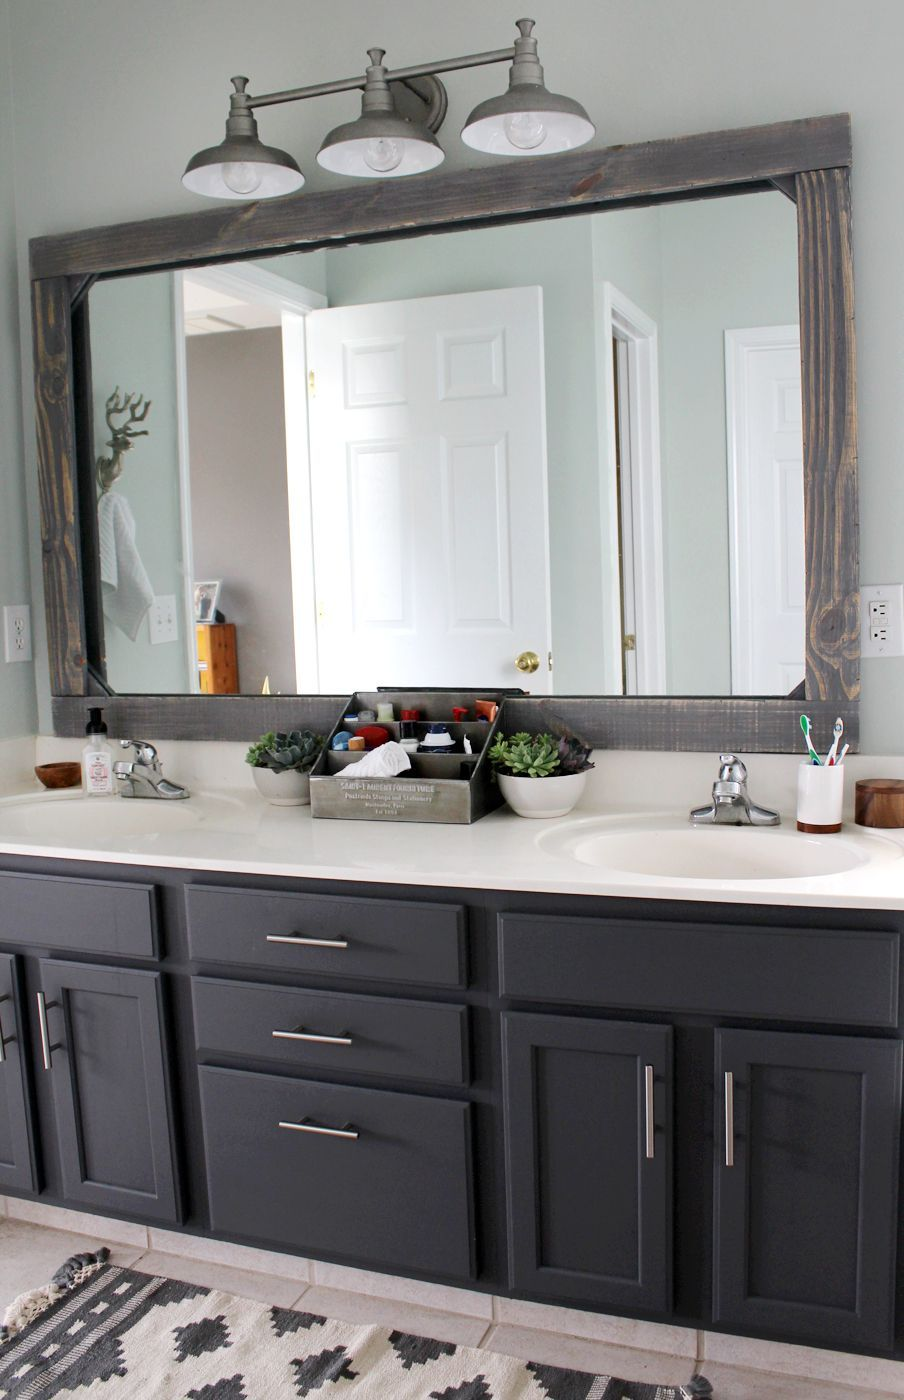 Bathroom Mirror Ideas Modern Farmhouse Bath Decor With Raw Wood Frame And Black Cabinets